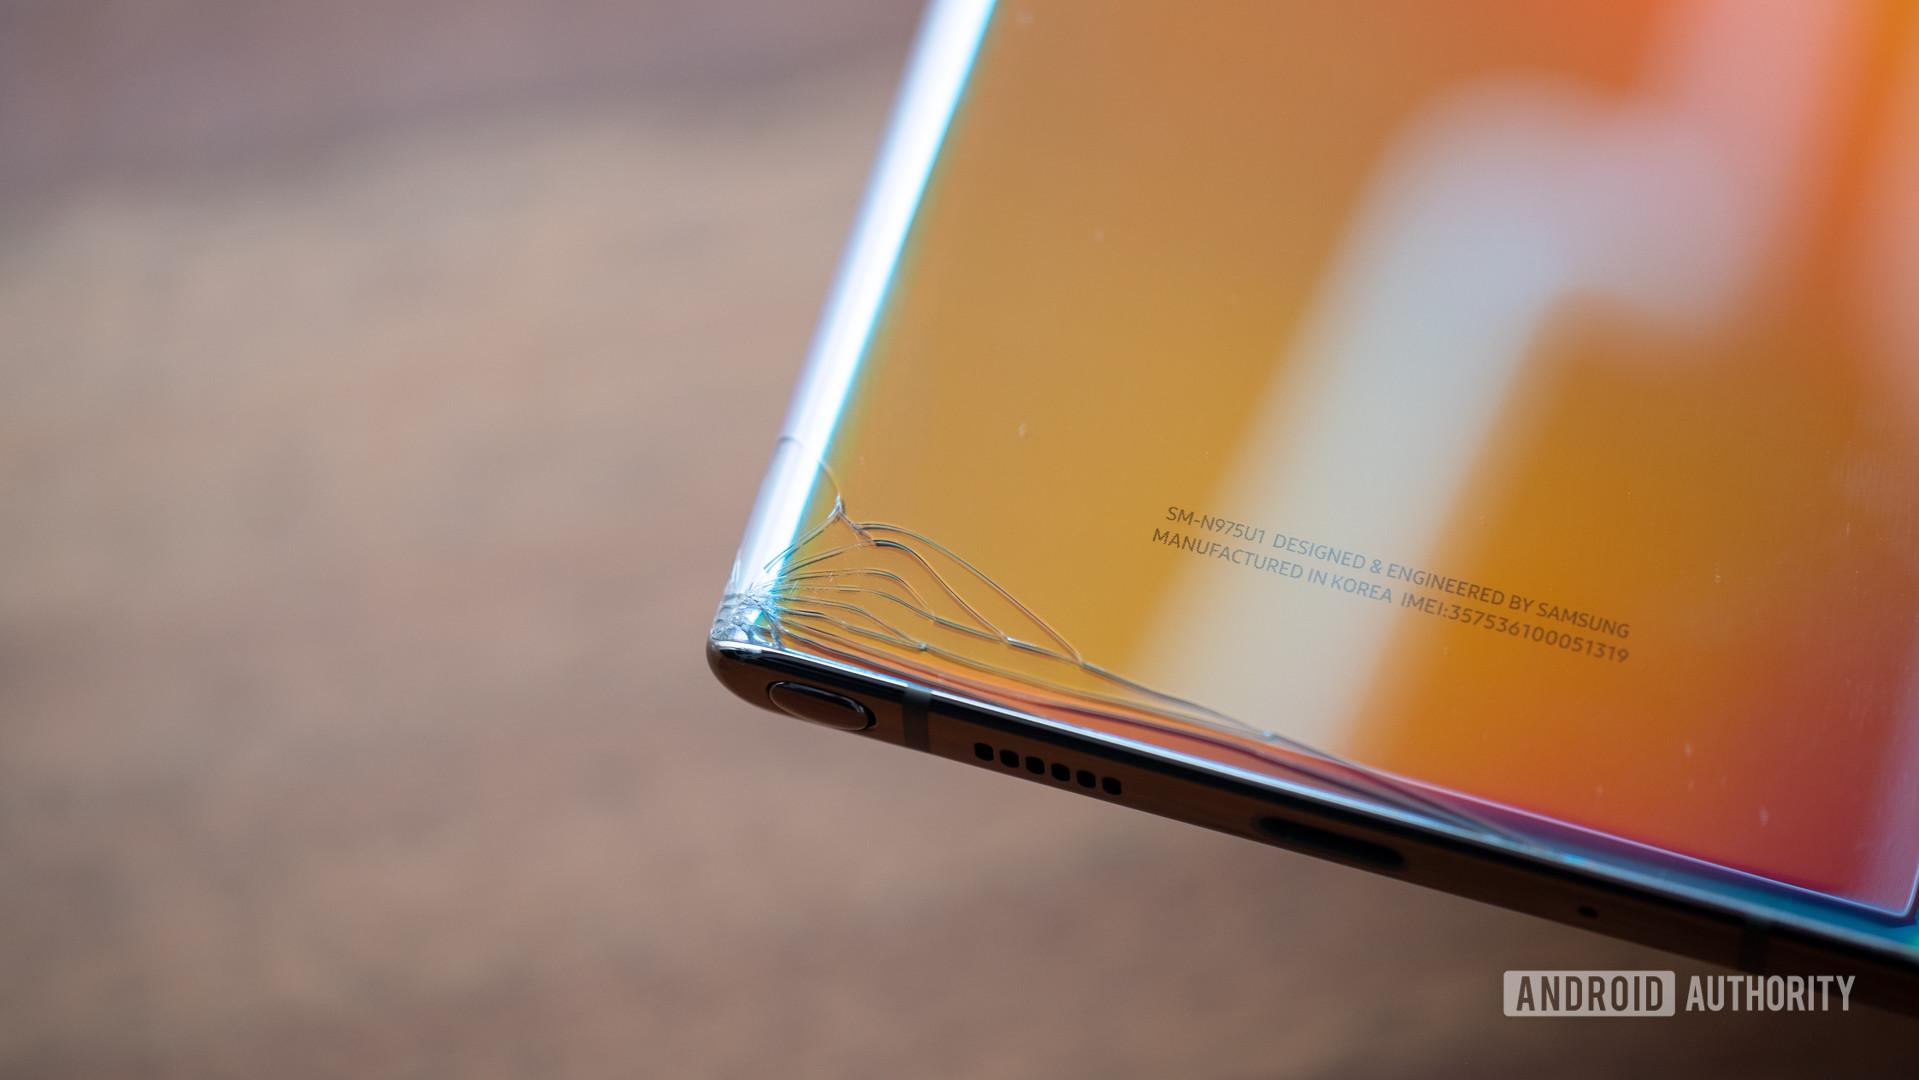 Samsung Galaxy Note 10 Plus back corner crack